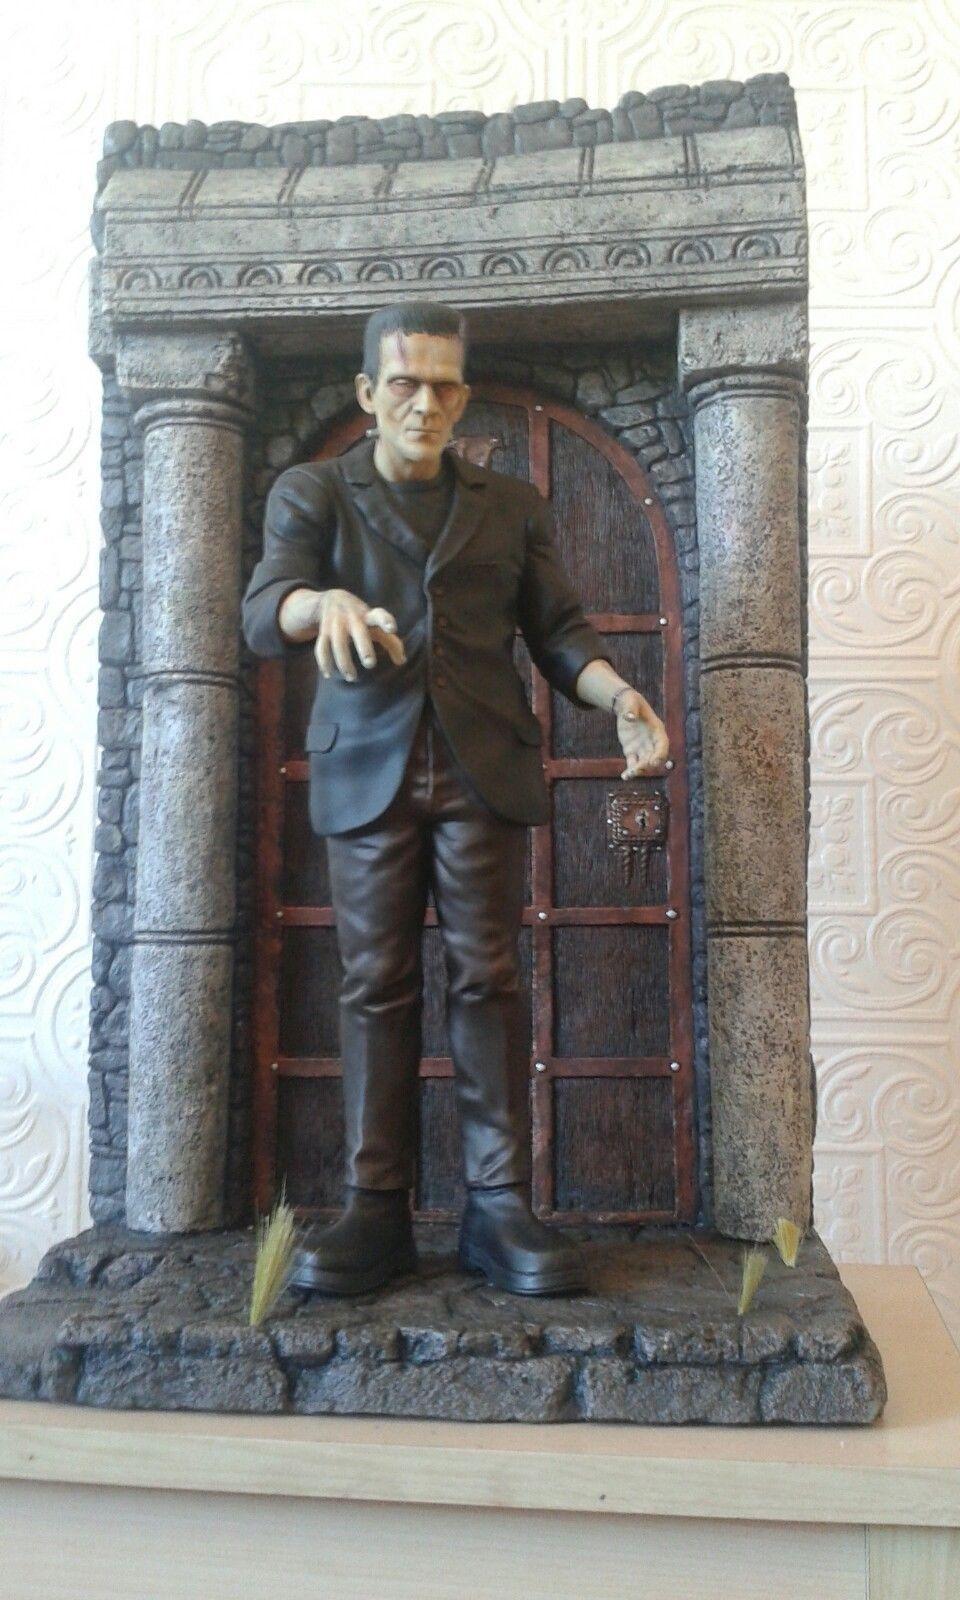 frankenstein model kit with diarama | eBay | Hollywood